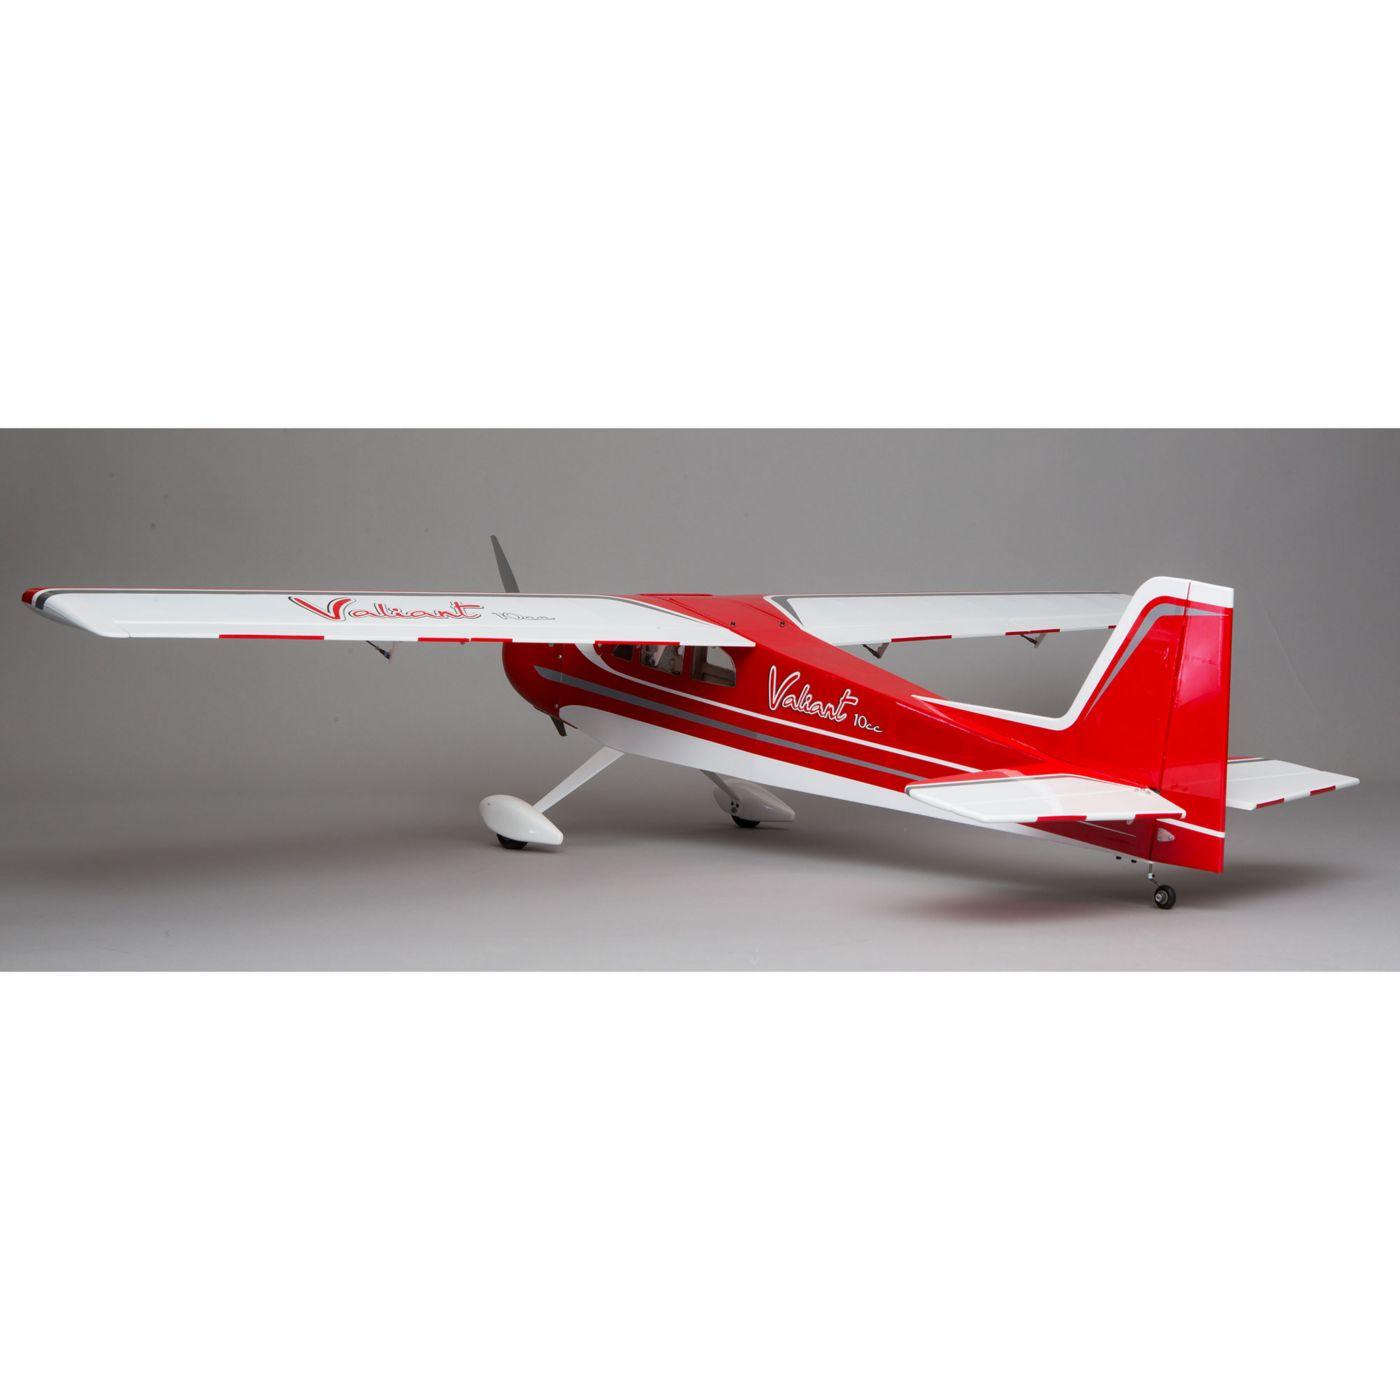 Valiant 10cc hangar 9